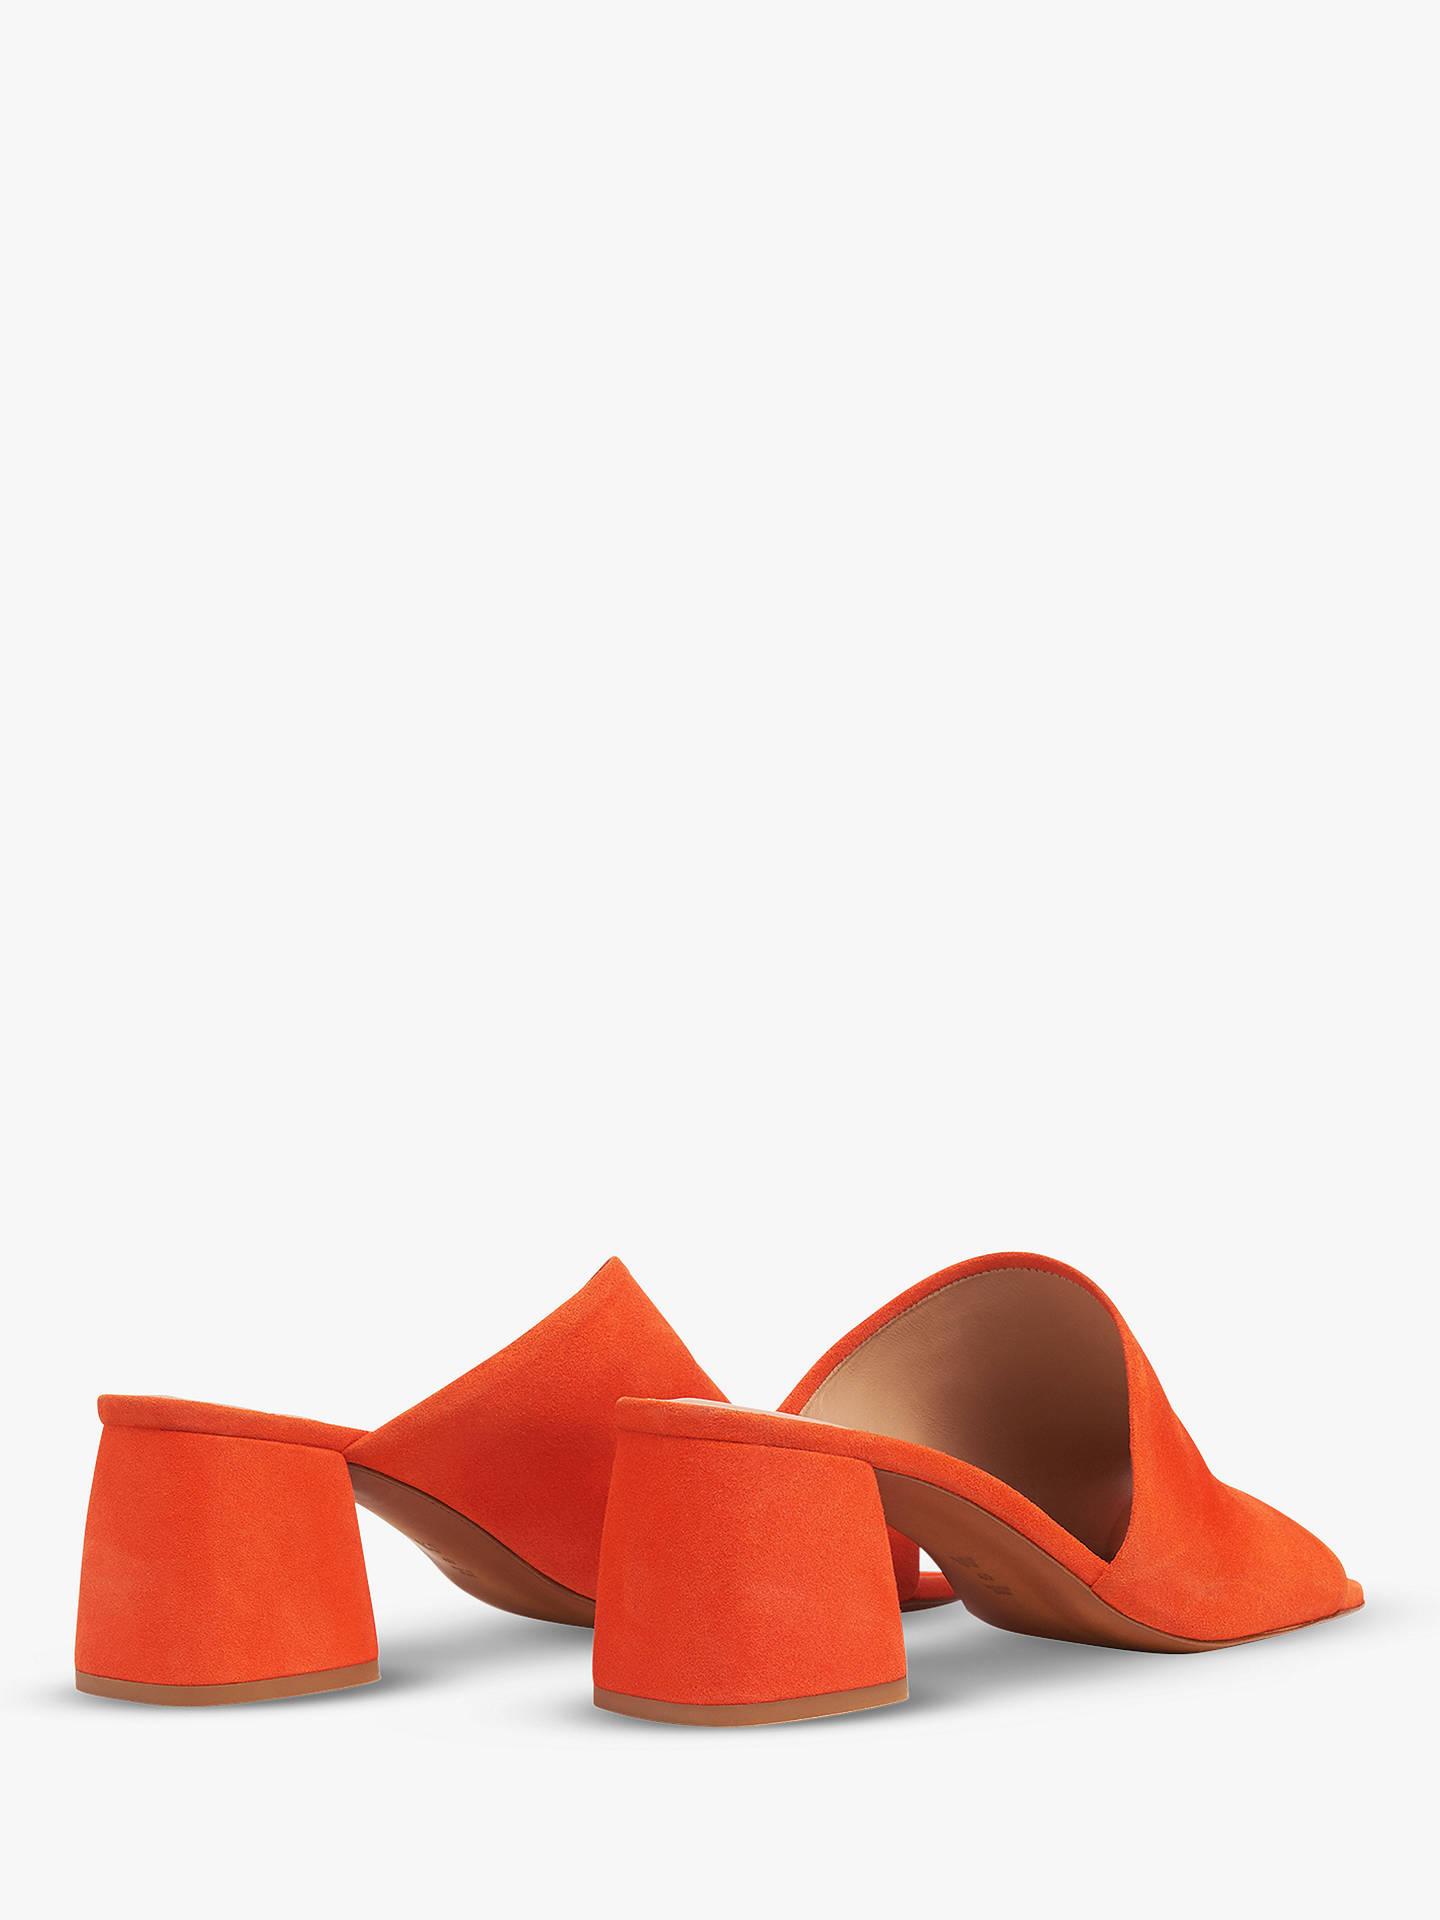 a4079c583442 Whistles Arcade Asymmetric Block Heel Sandals at John Lewis   Partners